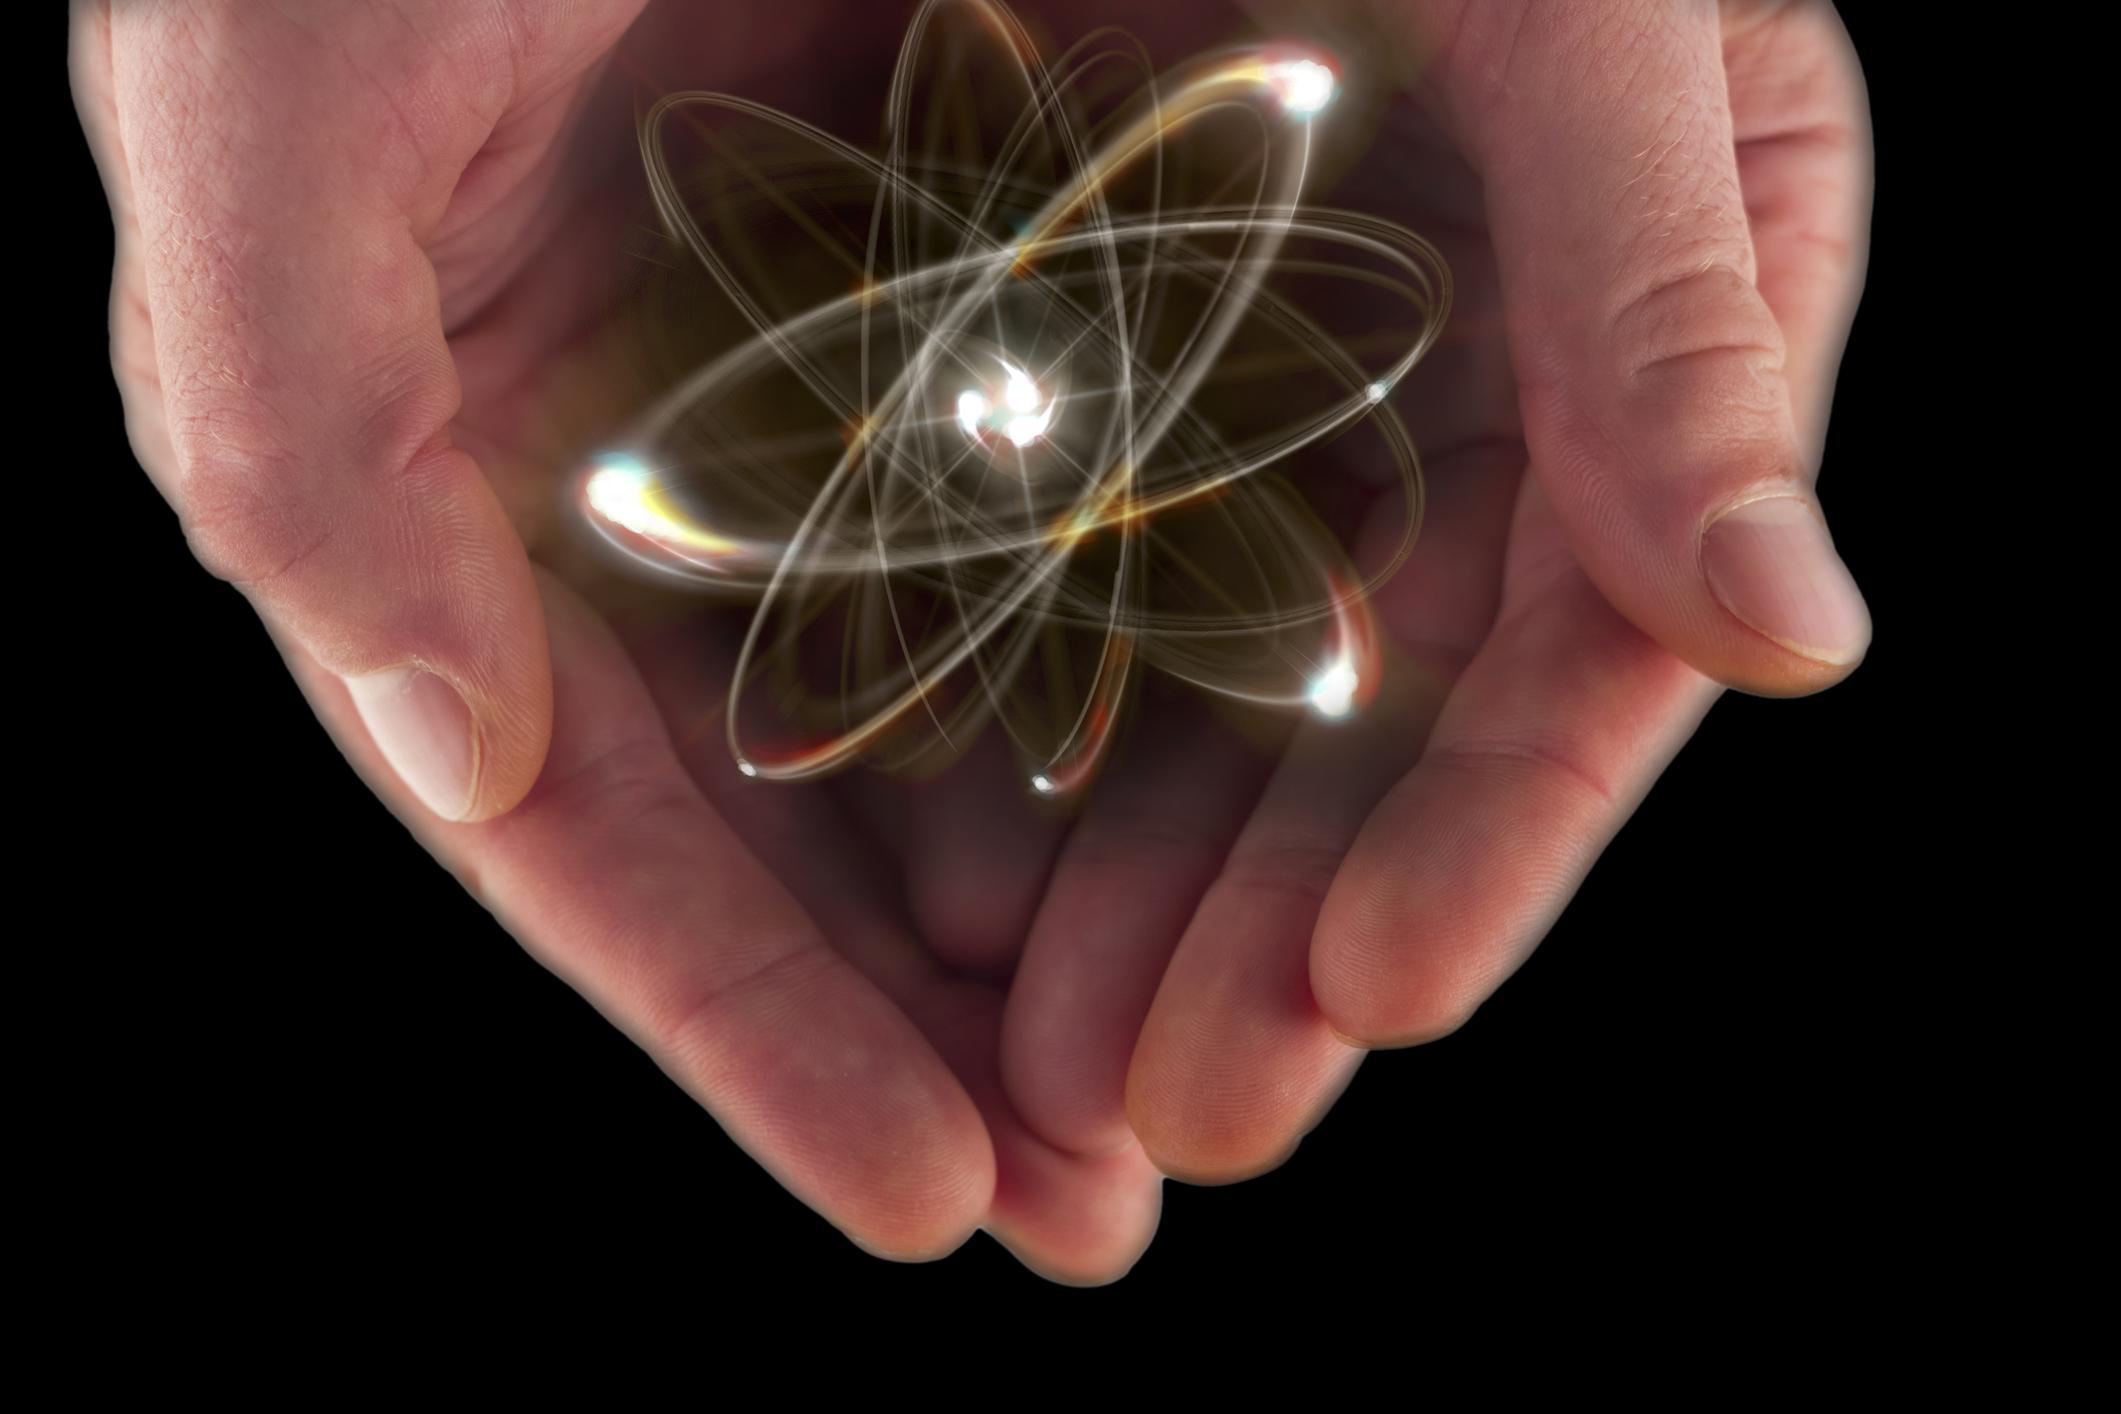 Hands cupping an atom.